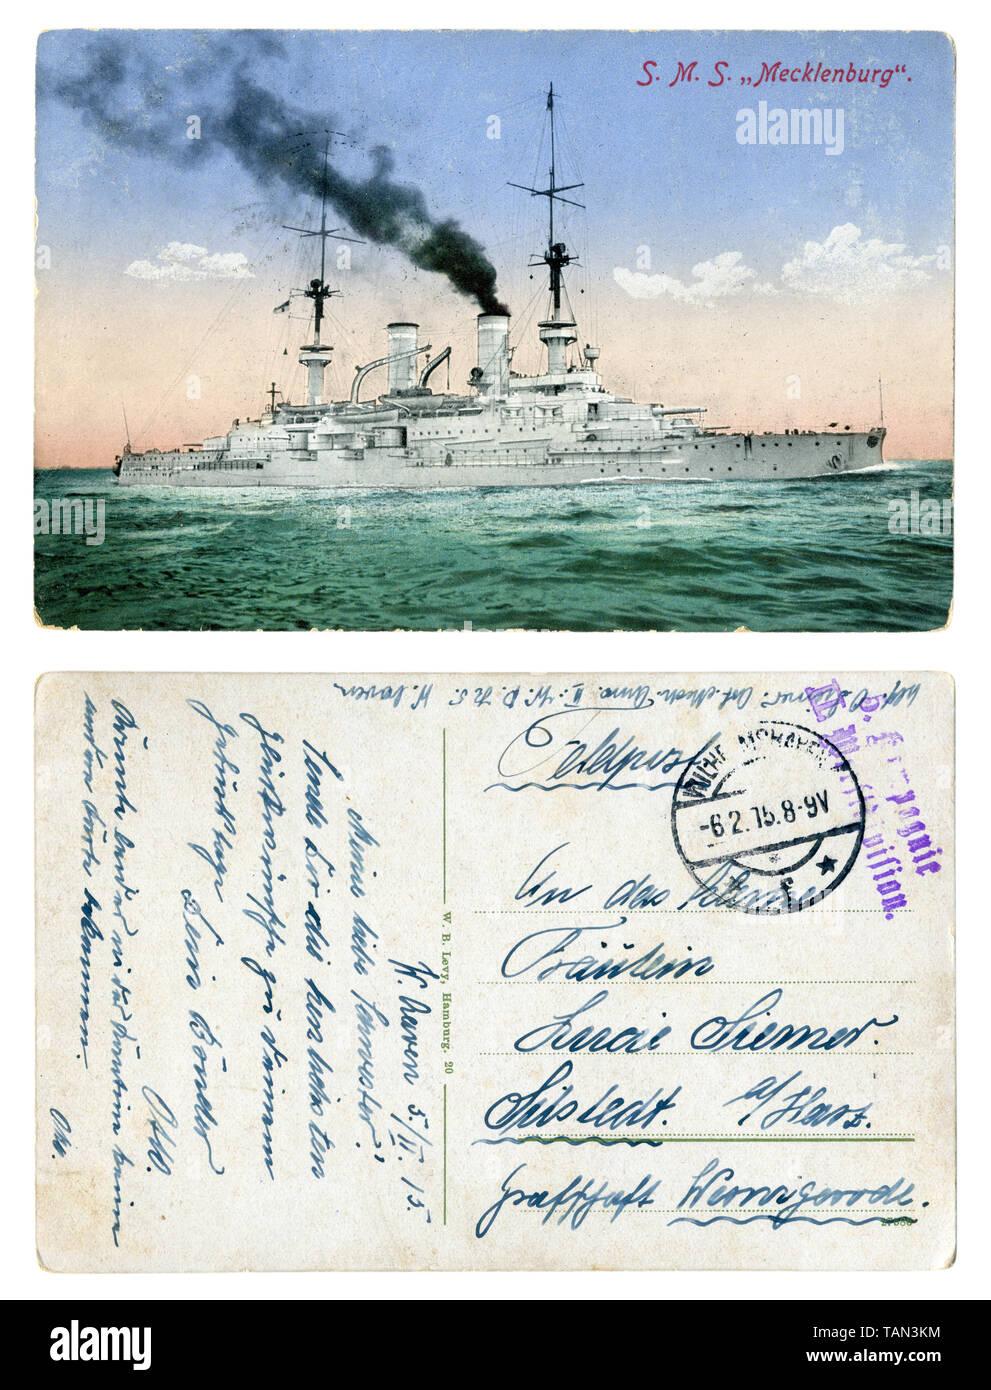 Ww1 Battleship Stock Photos & Ww1 Battleship Stock Images - Alamy